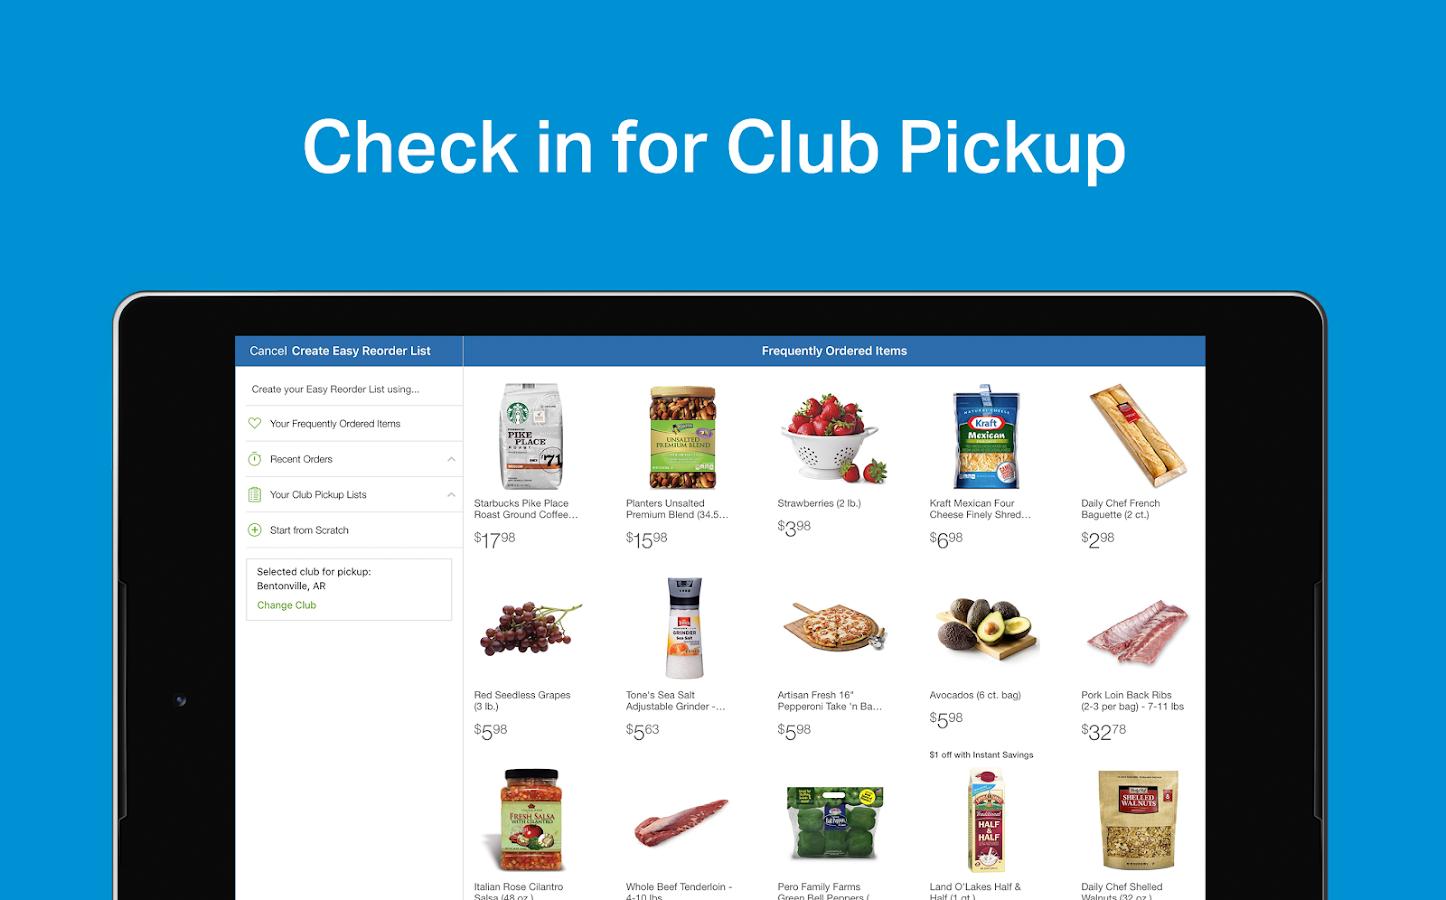 Sam S Club Wholesale Instant Savings Bulk Items Aplicaciones  # Kohl Muebles Farmacia